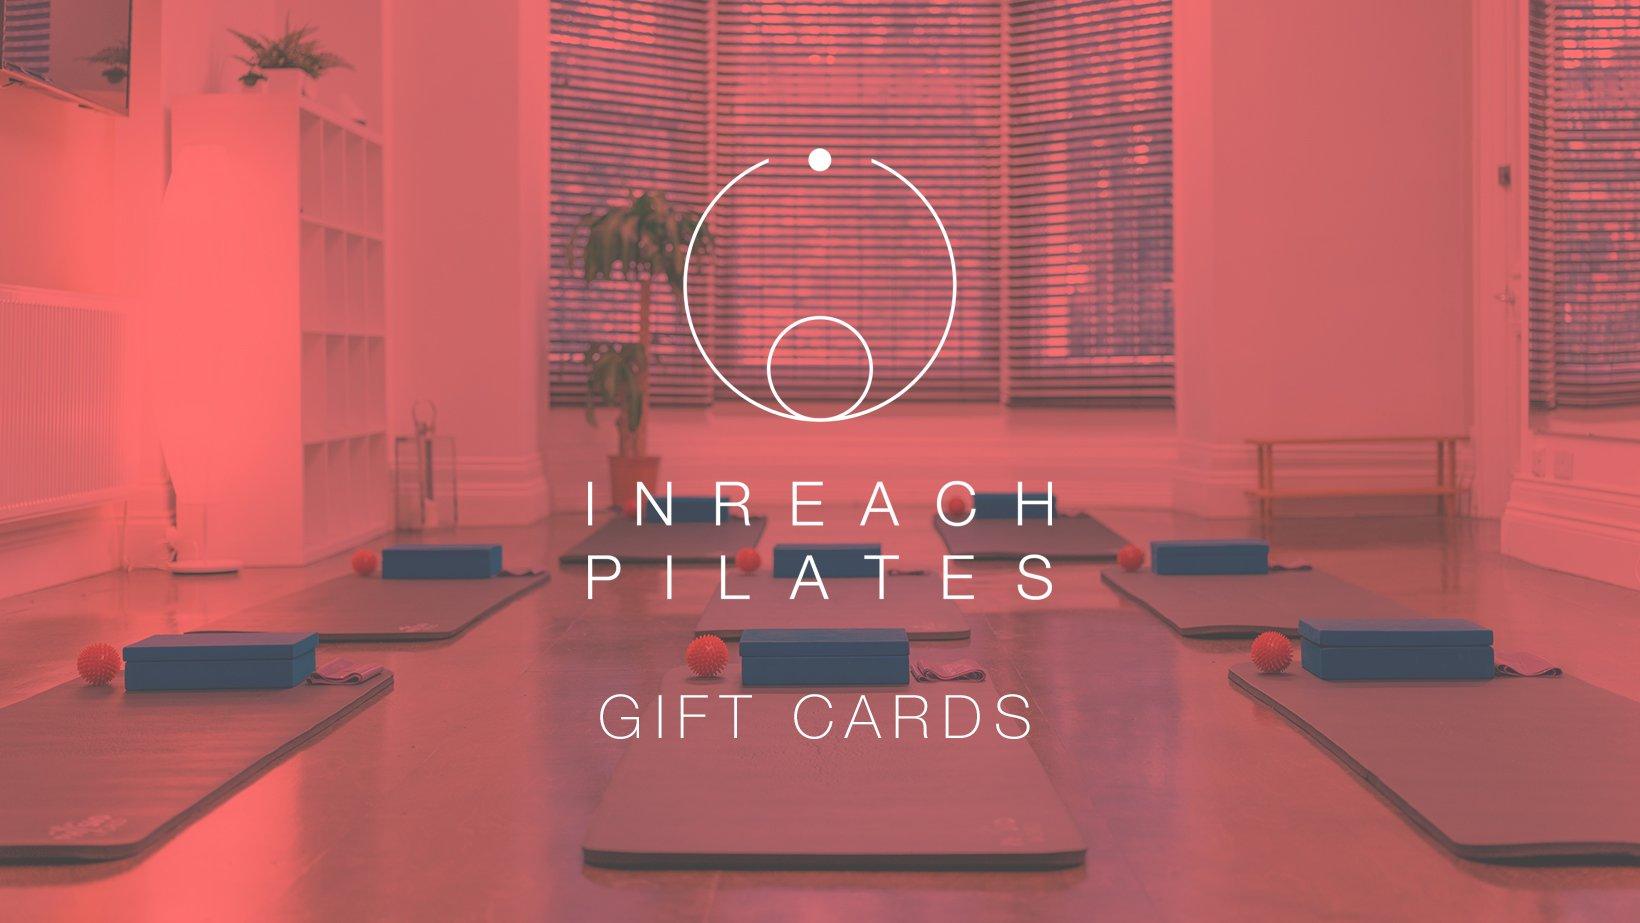 InReach Pilates Online - Gift Cards